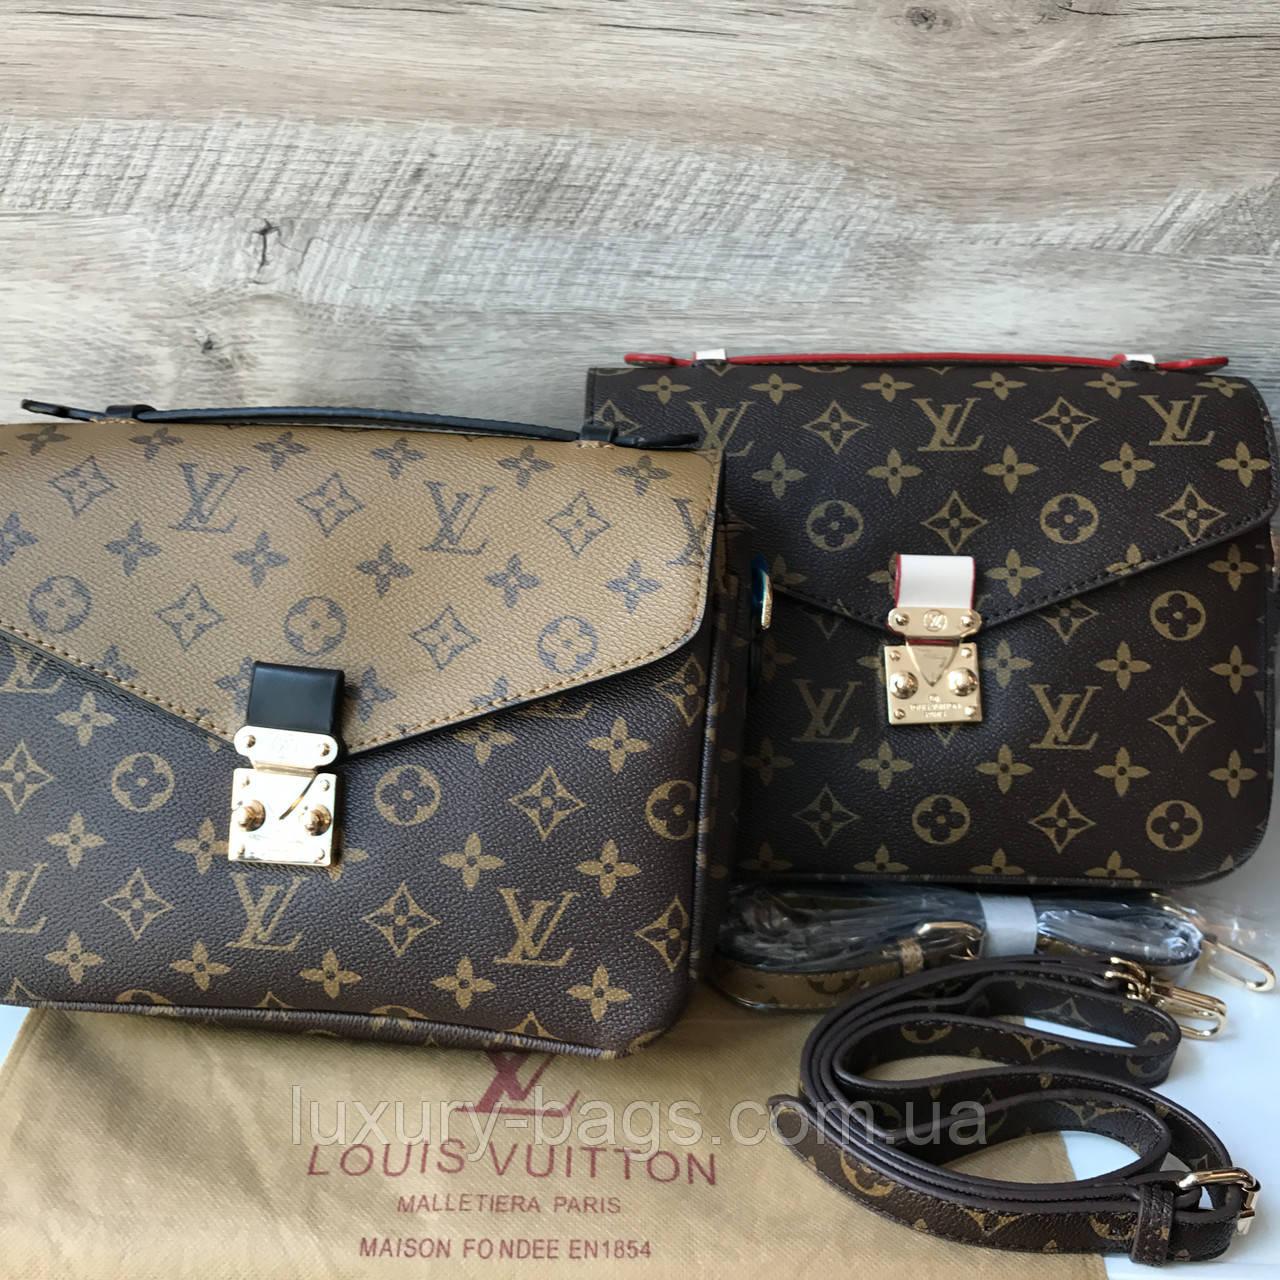 39d5a90d3fa8 Женская сумка Louis Vuitton Pochette Metis Луи Виттон монограм, цена 901  грн., купить в Одессе — Prom.ua (ID#649463635)